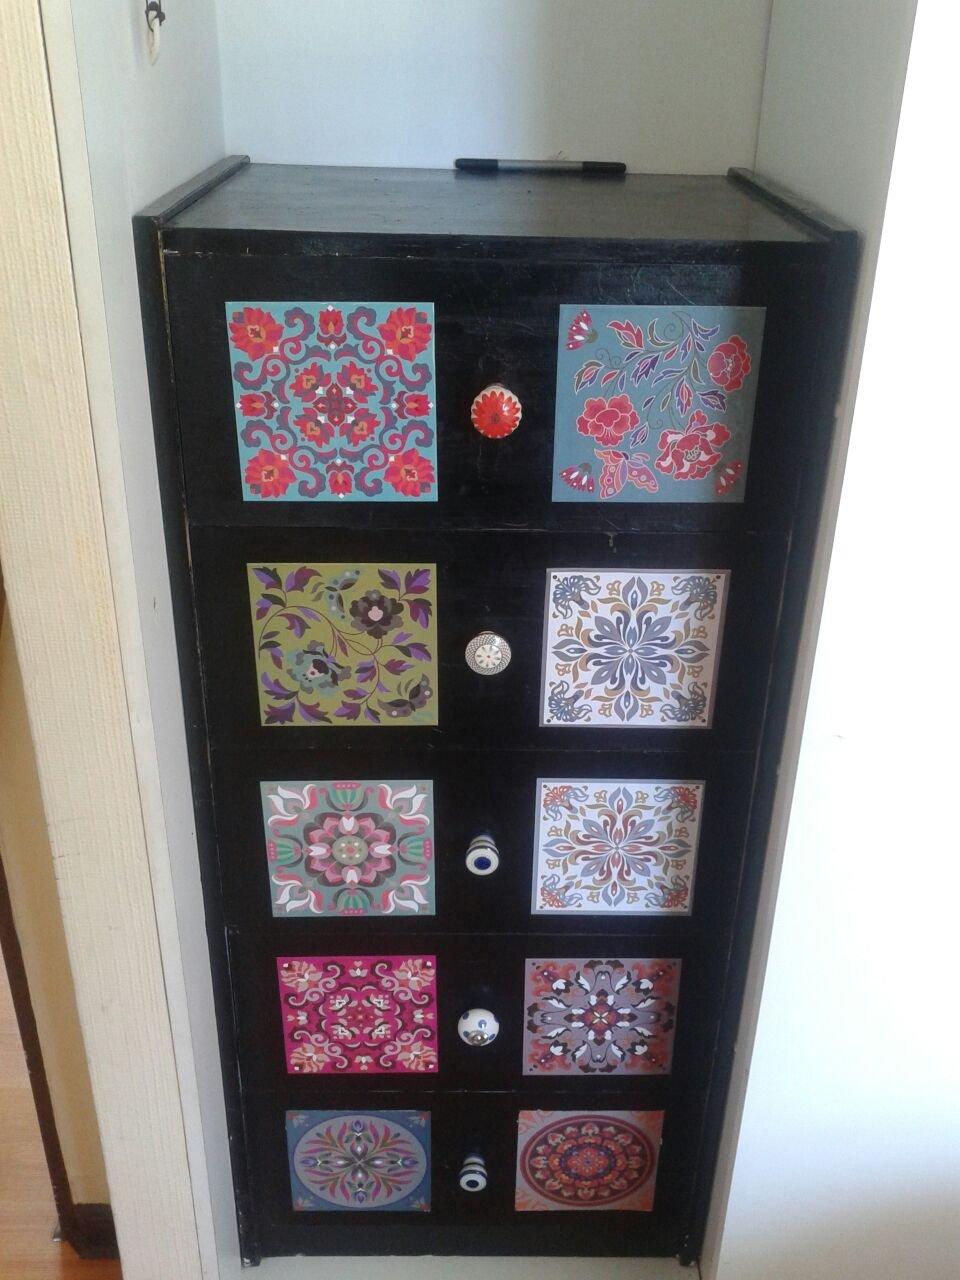 CHINA Decorative Tile Stickers Set 12 units 6x6 inches. Peel & Stick Vinyl Tiles. Home Decor. Furniture Decor. Backsplash. by VALDECO